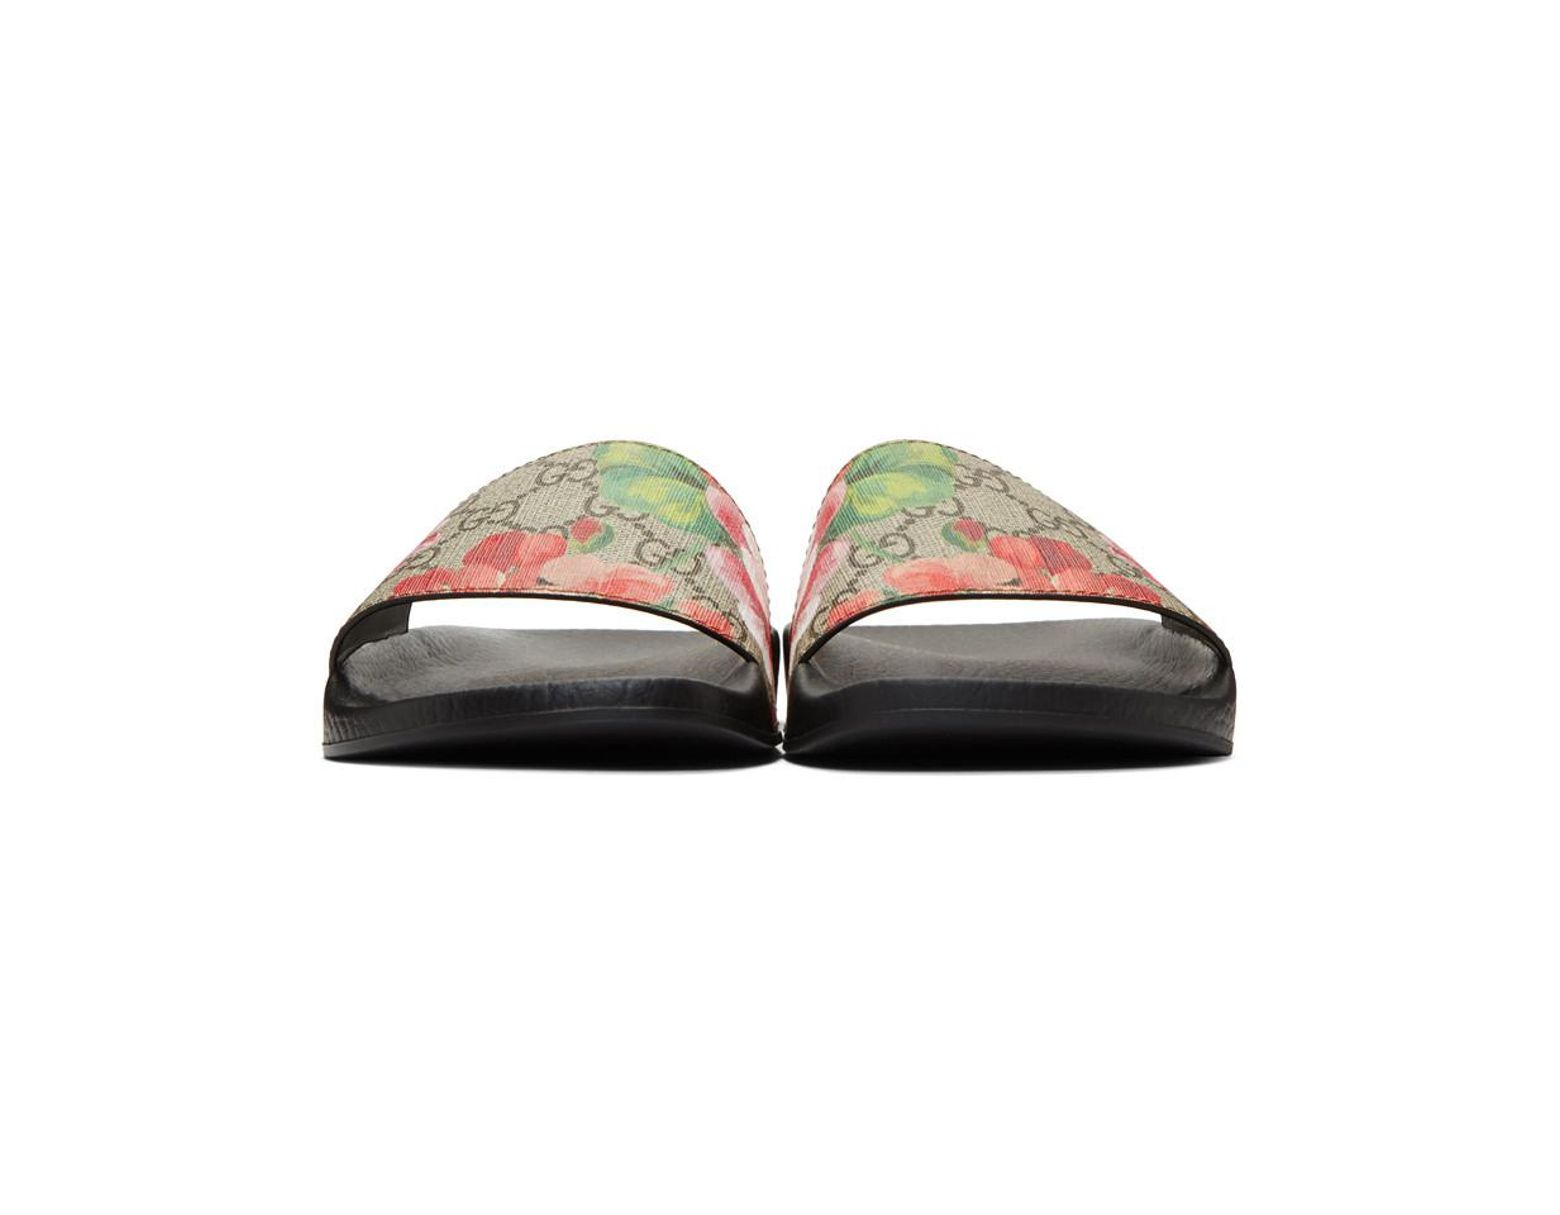 75458abbe Gucci Blooms Supreme Canvas Slides - Lyst